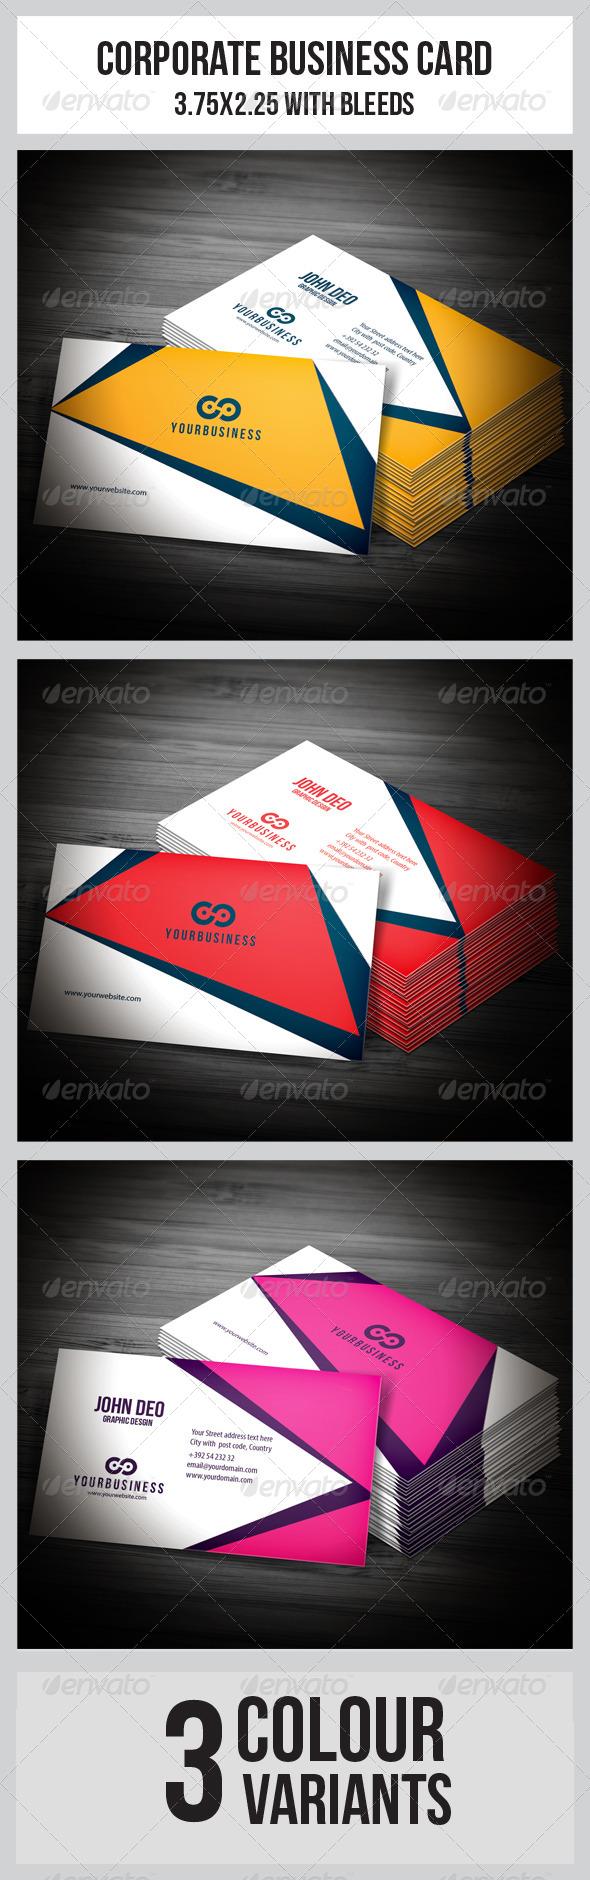 Multipurpose Business Card  - Corporate Business Cards